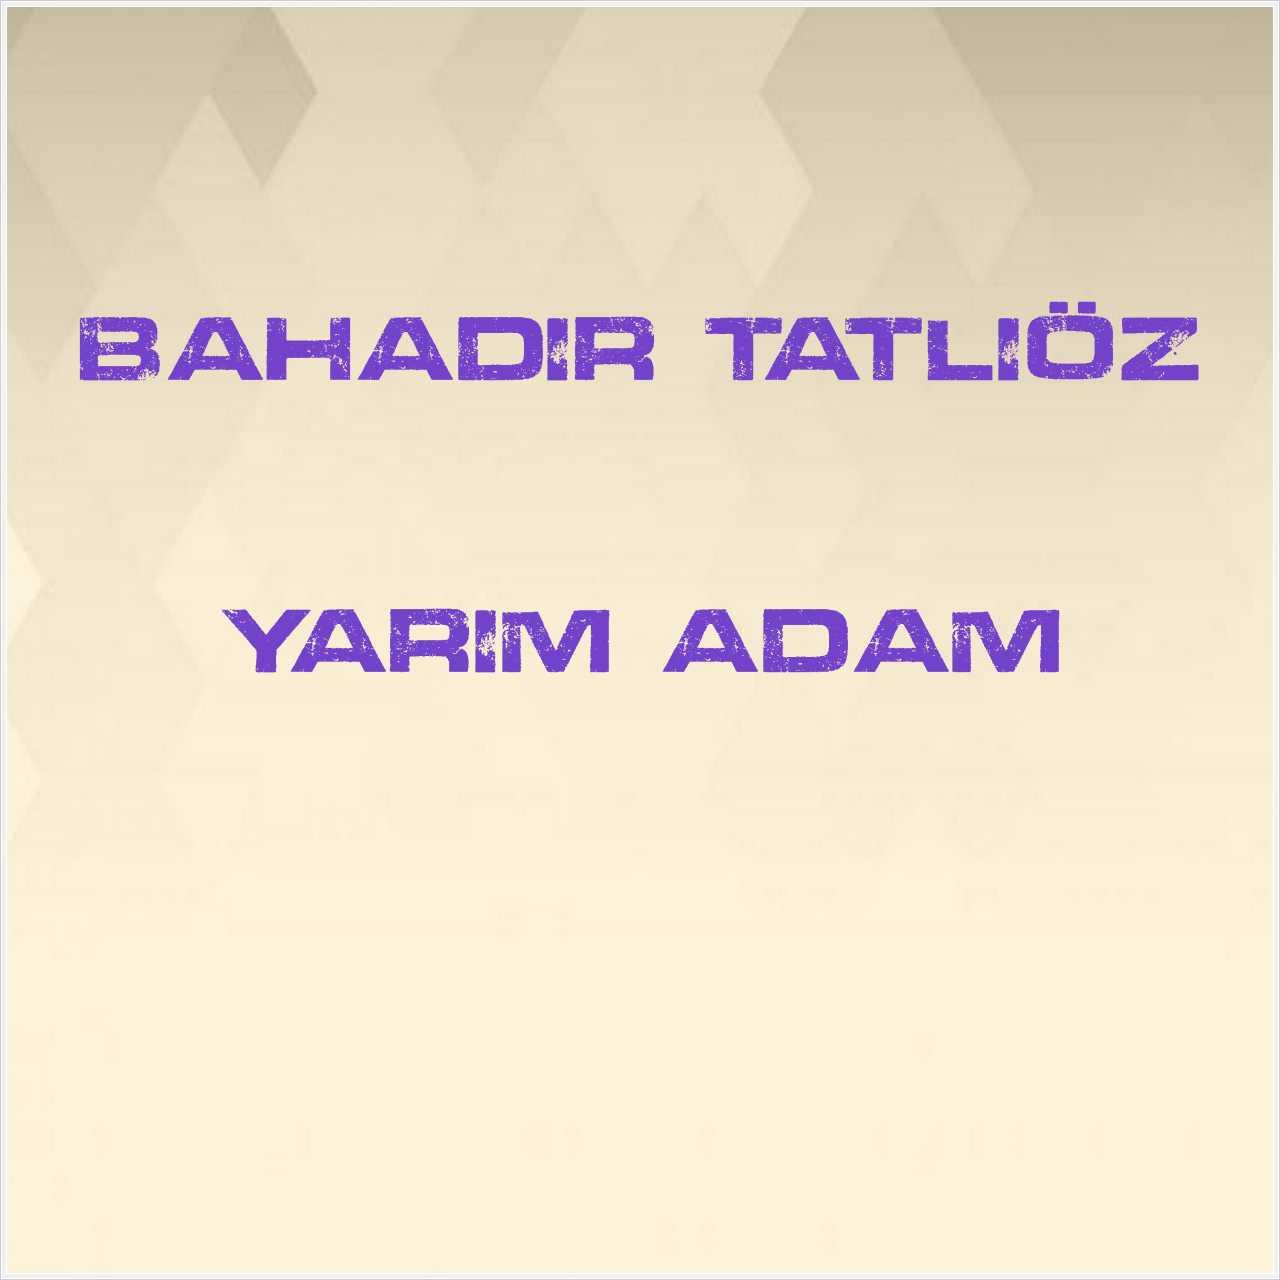 دانلود آهنگ جدید Bahadır Tatlıöz به نام Yarım Adam